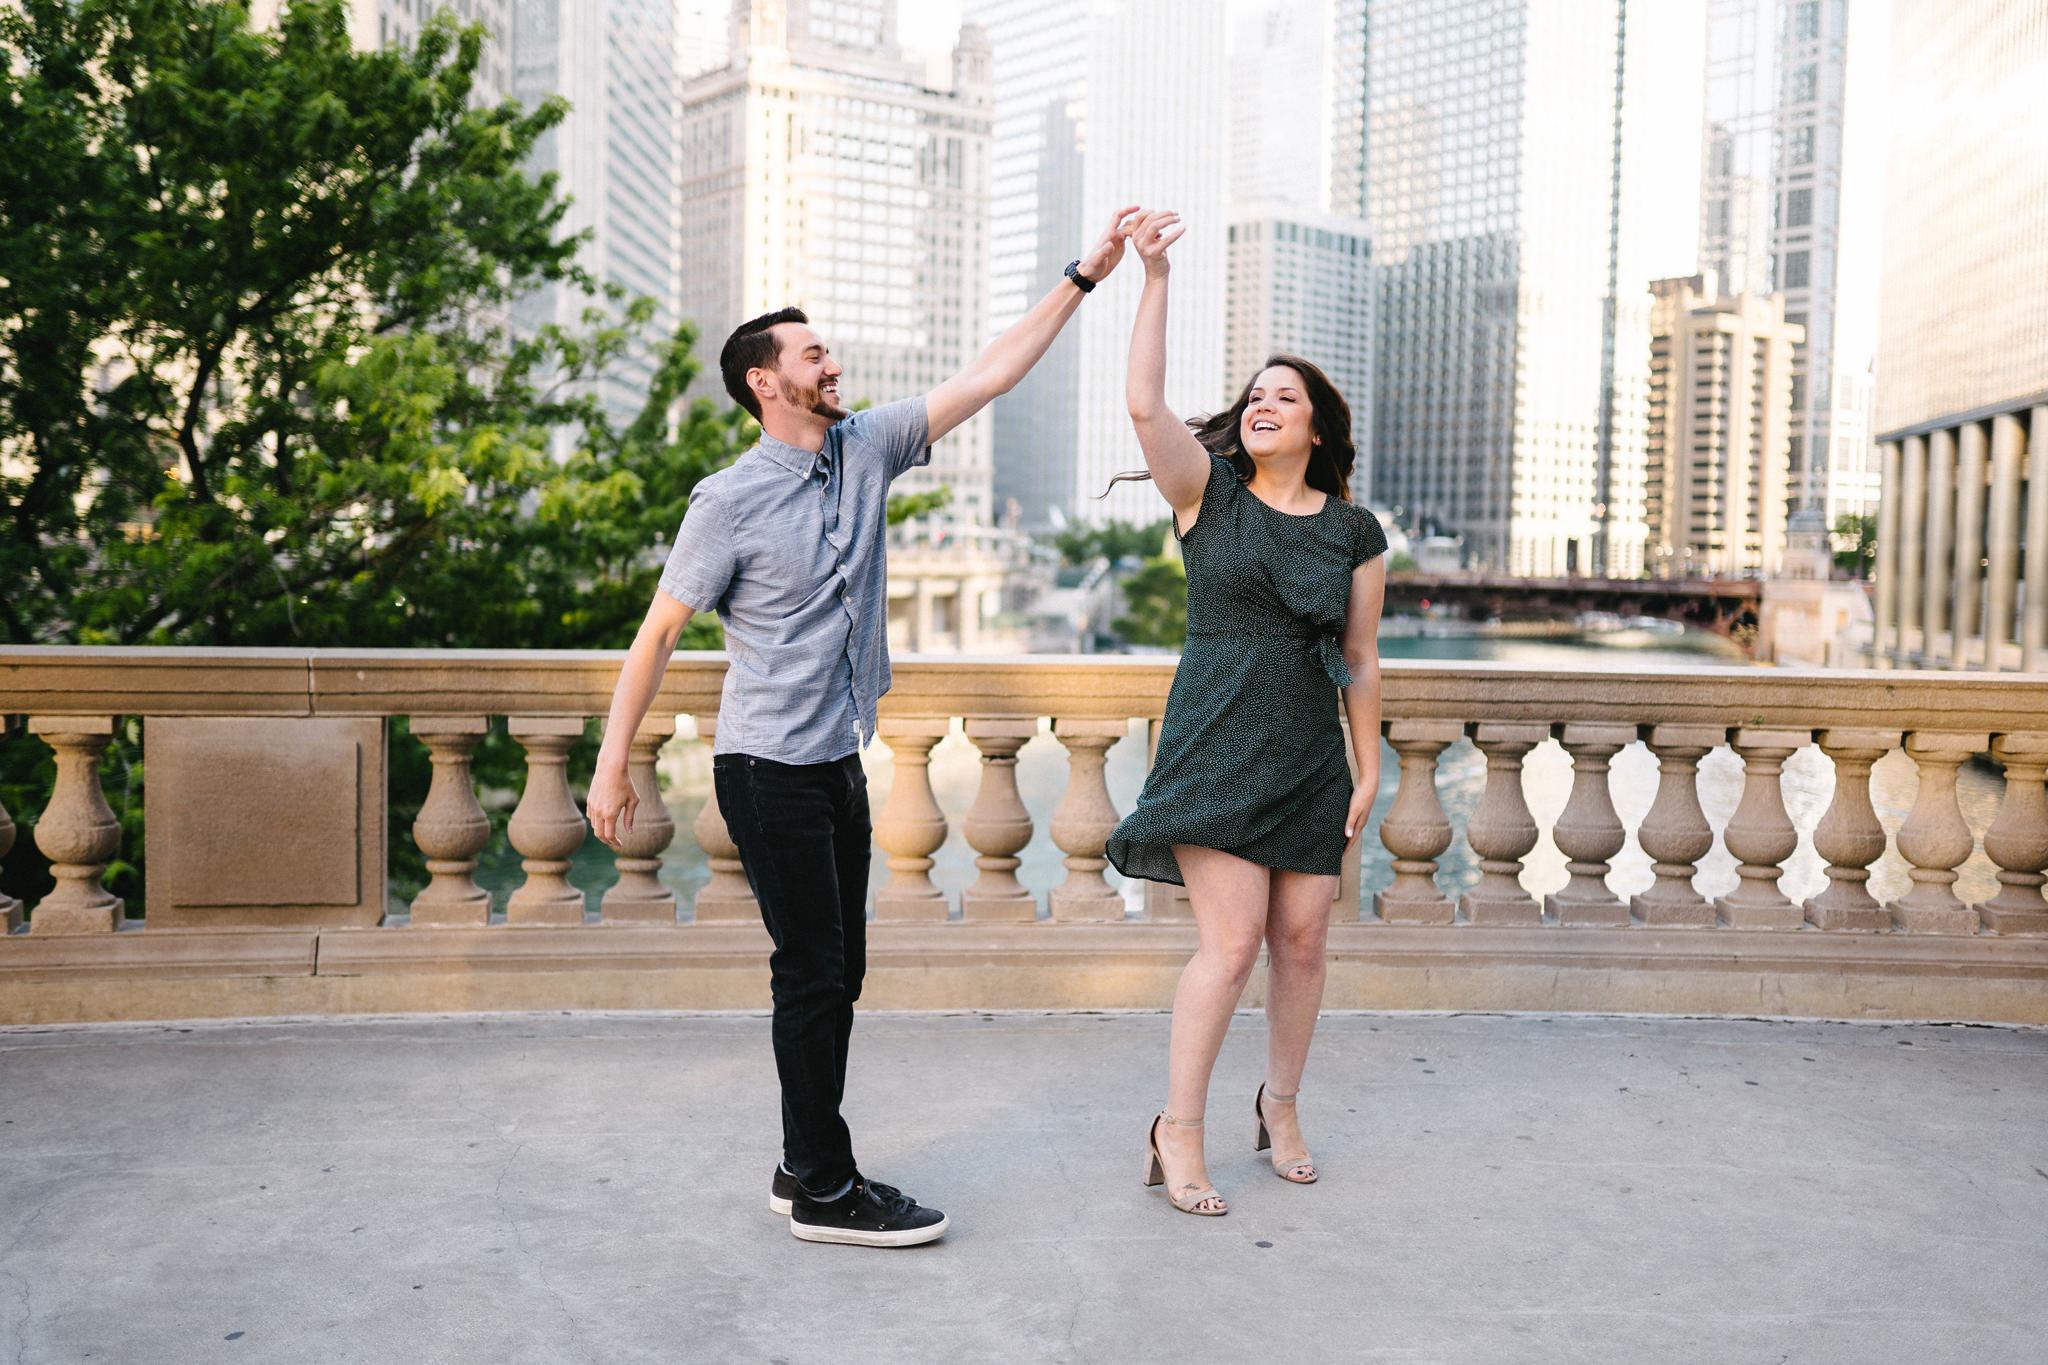 004-rempel-photography-chicago-wedding-inspiration-matt-mariana-riverwalk-engagement-session-city-view-loft-ohana-events.jpg